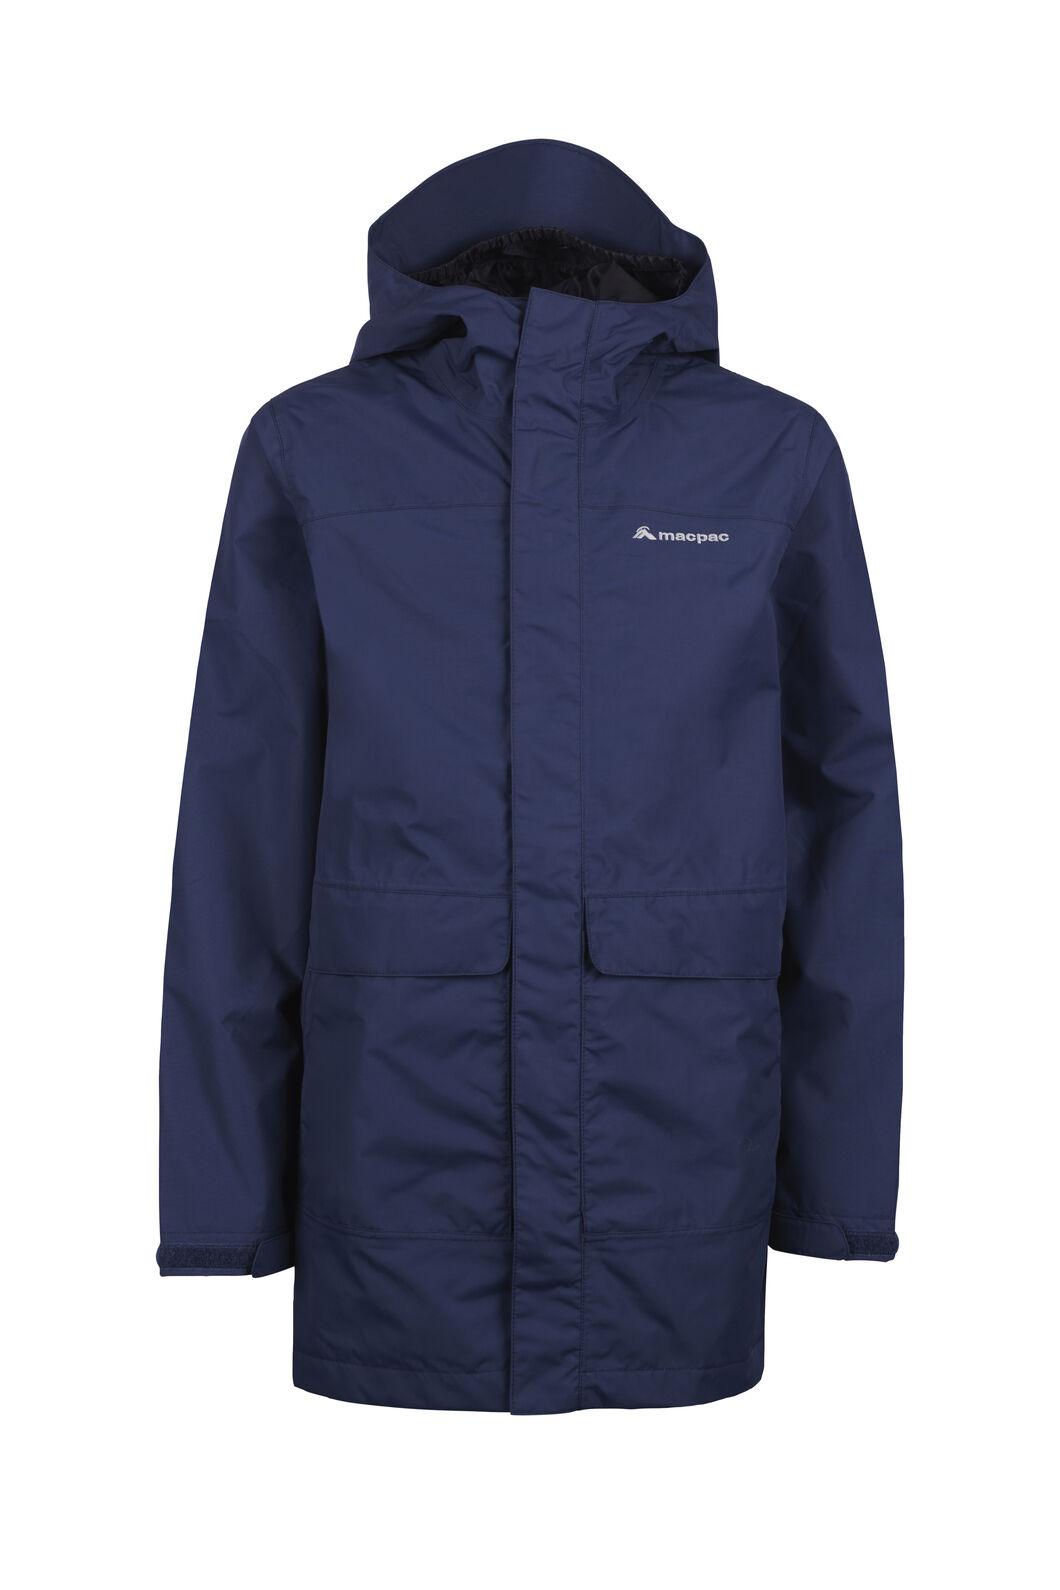 Macpac Lagoon Long Rain Jacket — Kids', Medieval Blue, hi-res